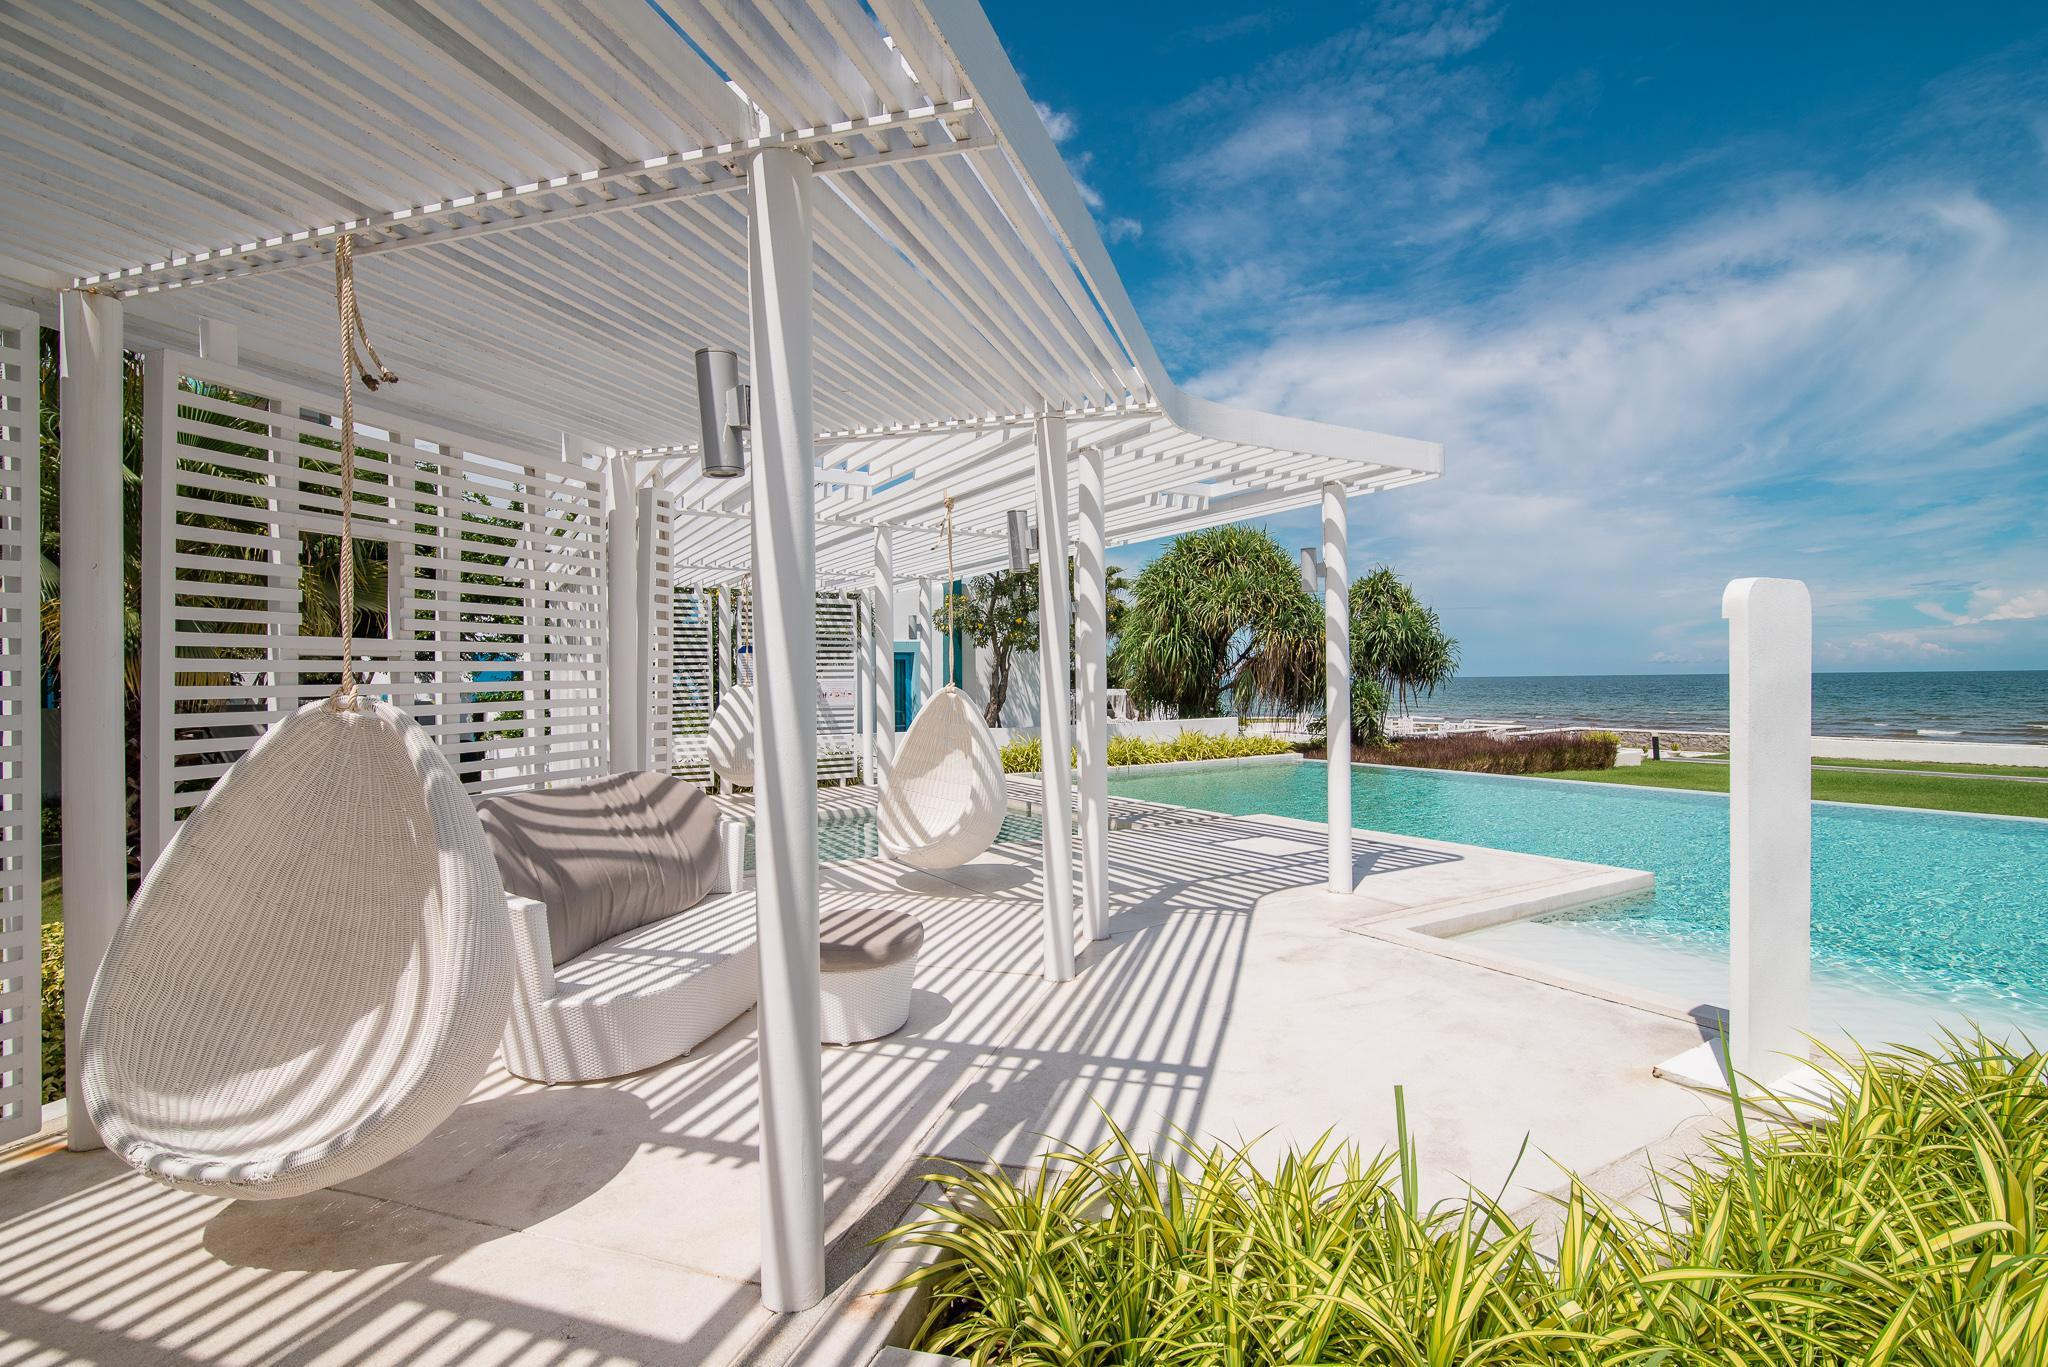 Unwind in a Luxury Beach Condo with private beach อพาร์ตเมนต์ 2 ห้องนอน 2 ห้องน้ำส่วนตัว ขนาด 75 ตร.ม. – ชายหาดหัวหิน